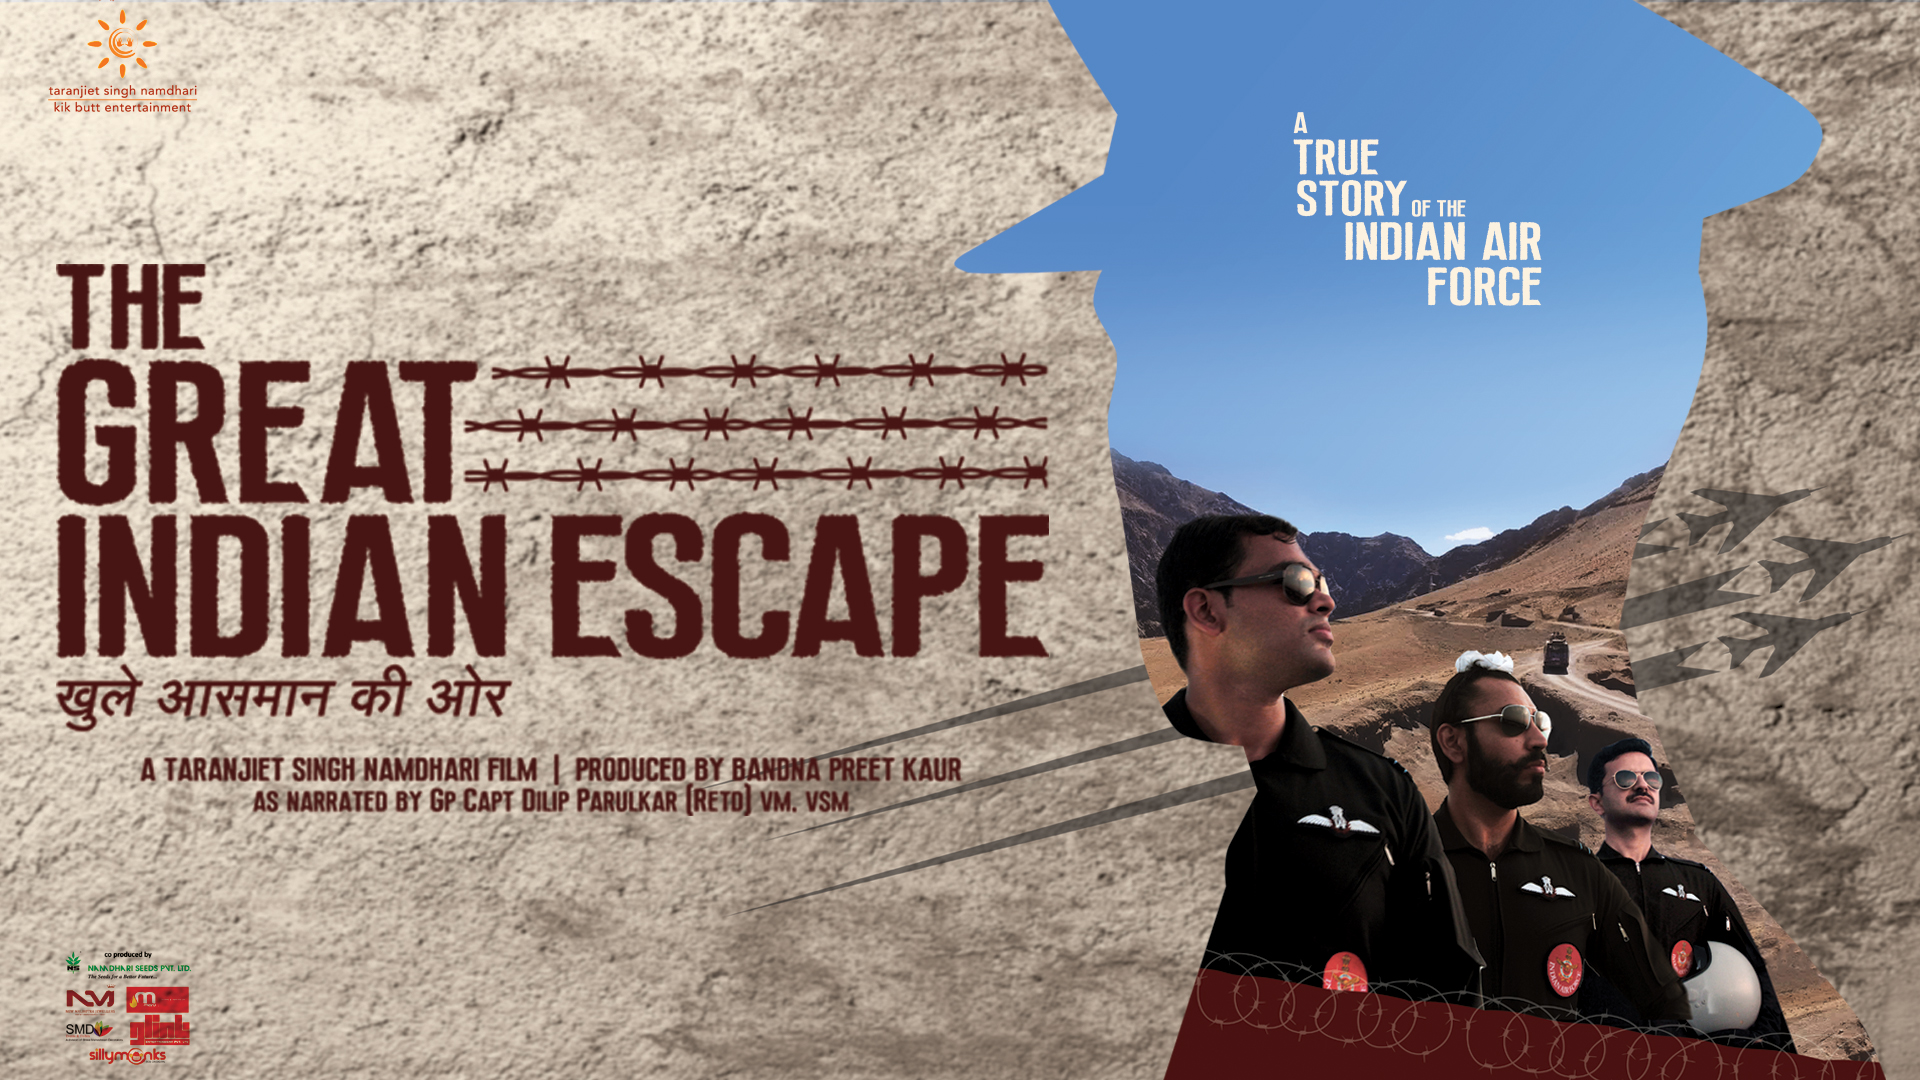 The Great Indian Escape - Khulay Asmaan Ki Oar